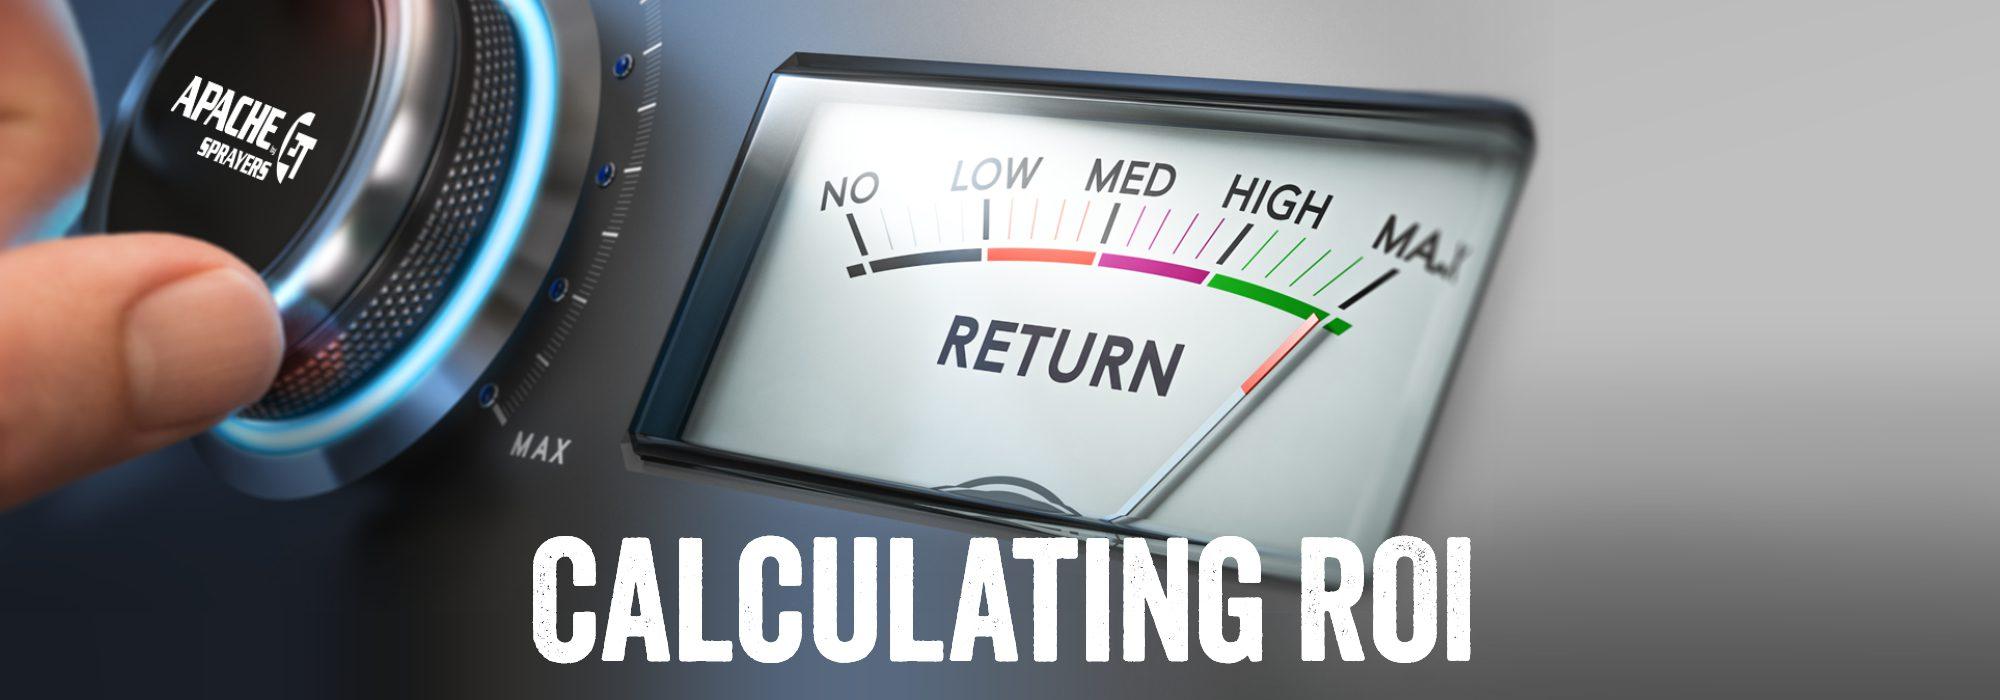 Calculating ROI Header Graphic